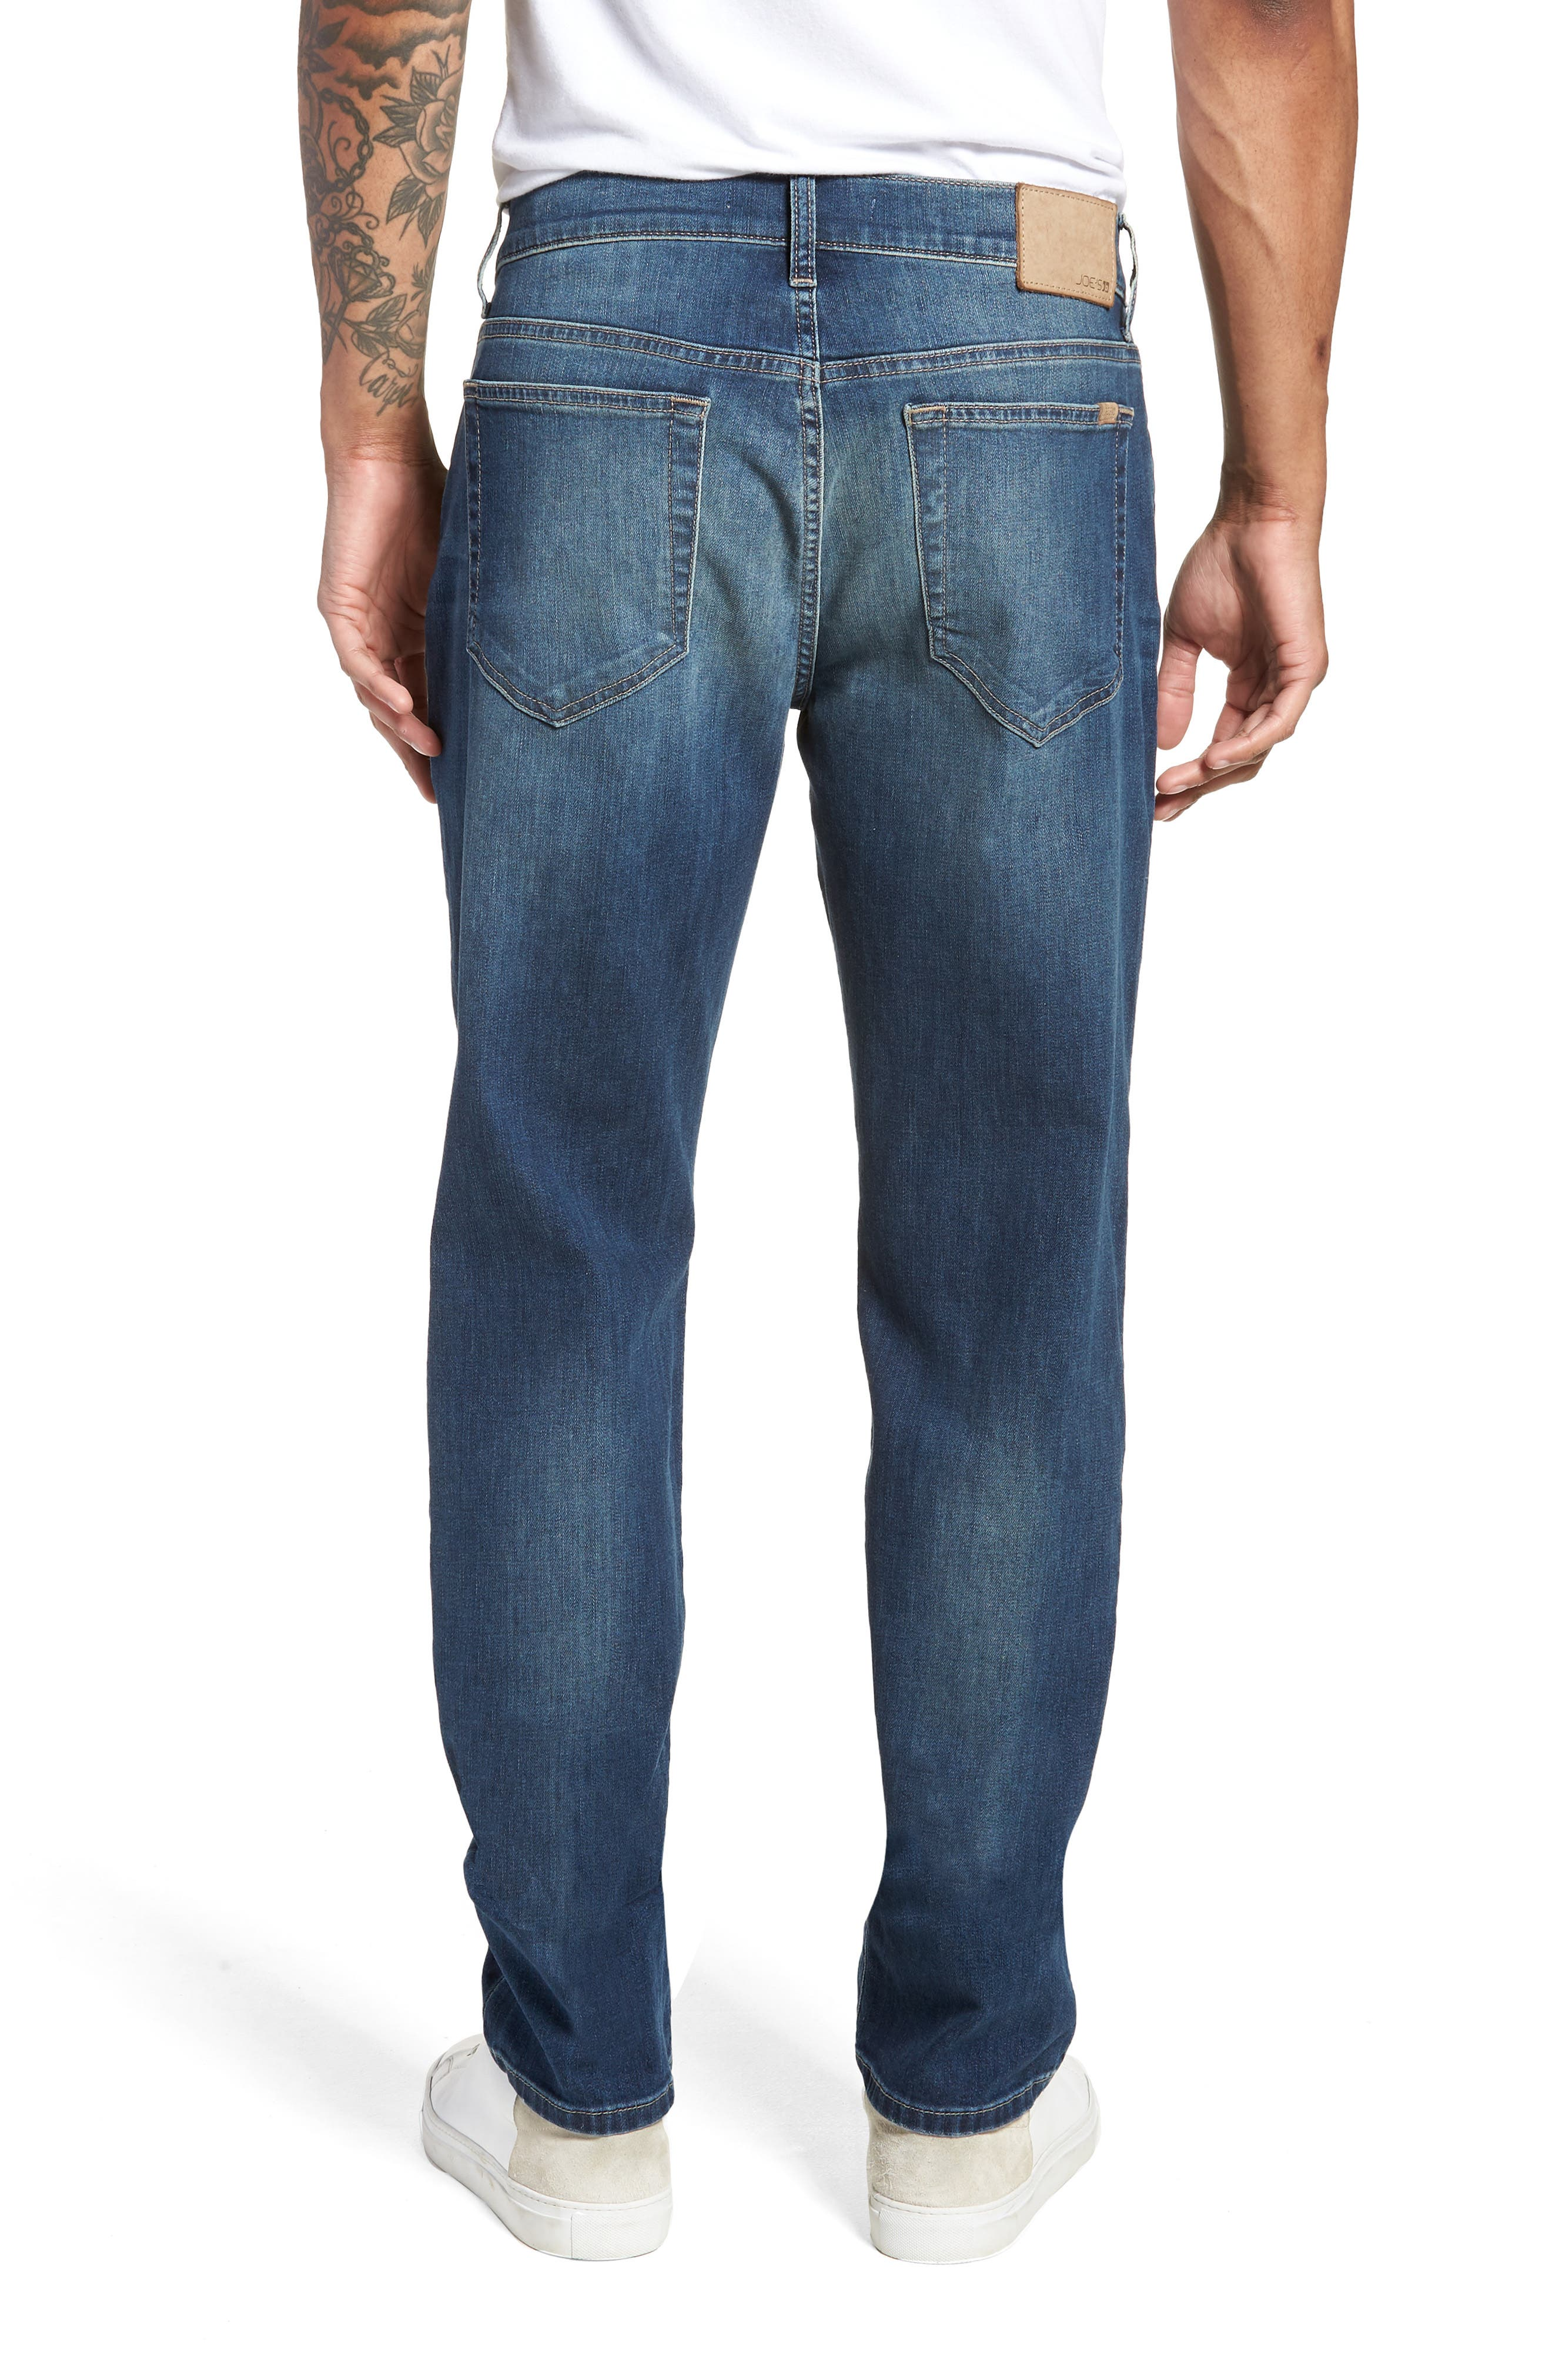 Brixton Slim Straight Fit Jeans,                             Alternate thumbnail 2, color,                             Brady